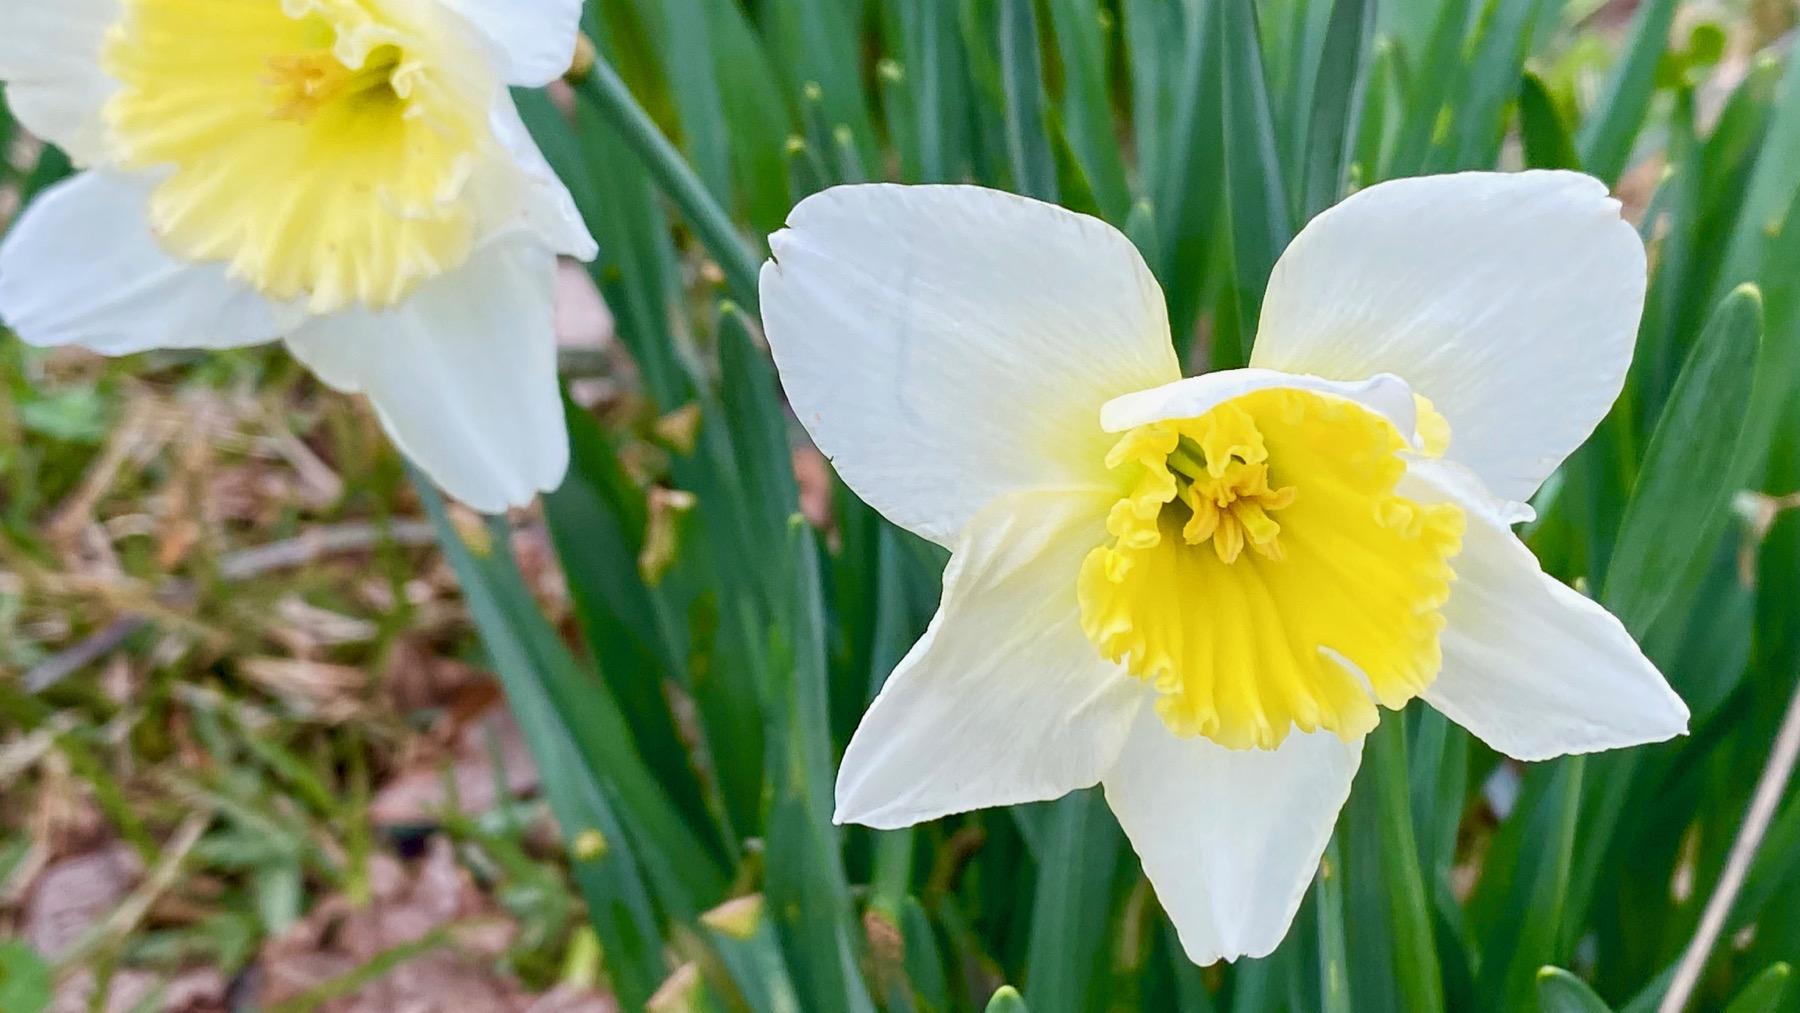 Daffodils bicolor